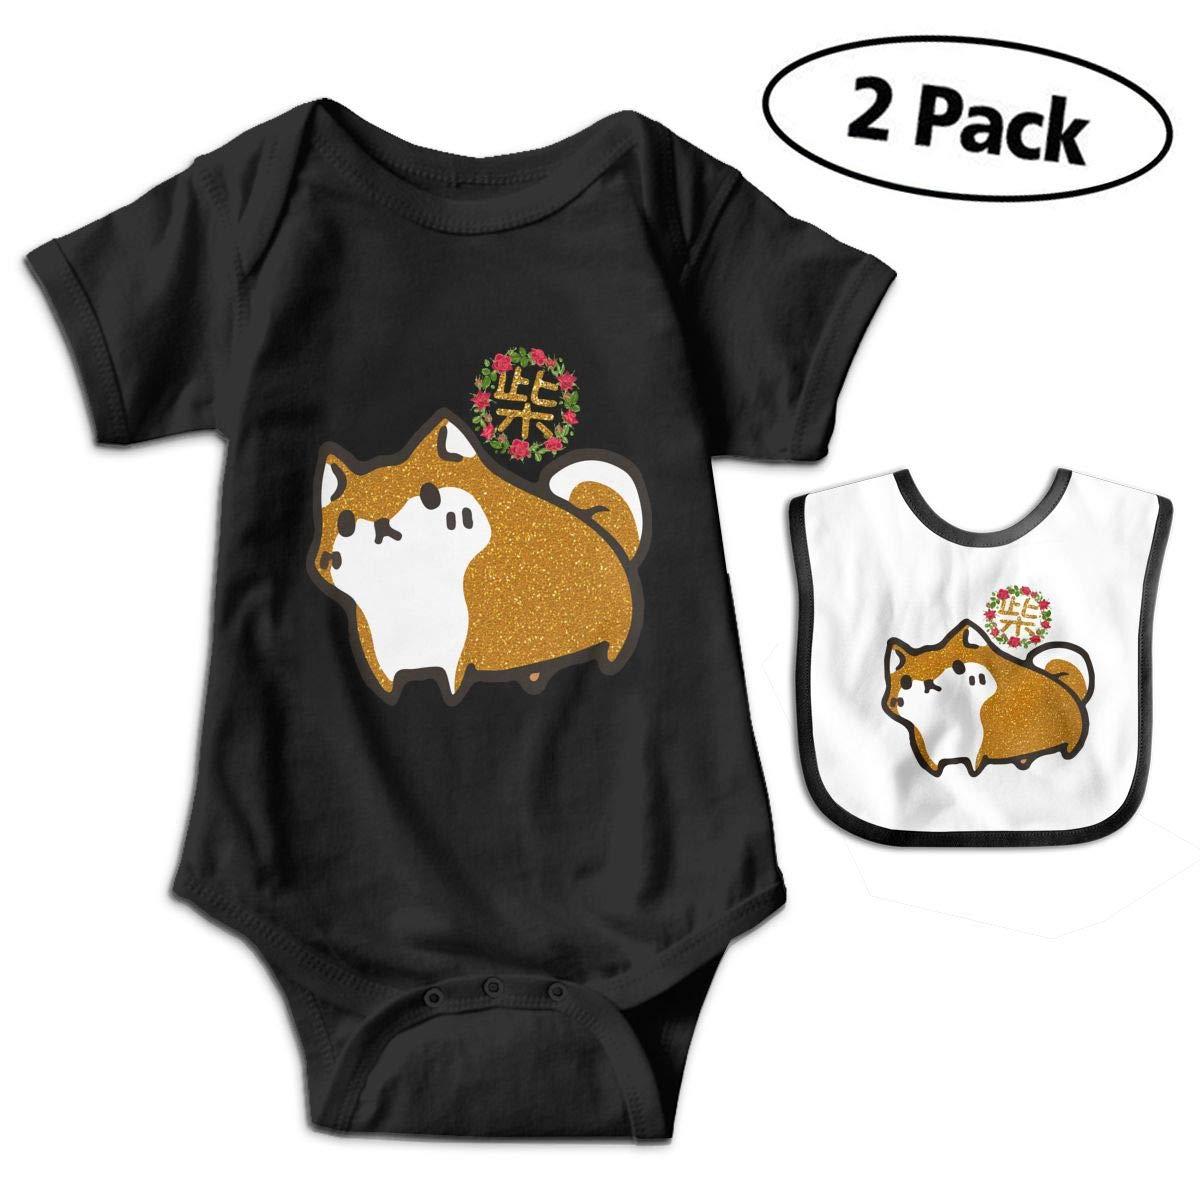 Shiba Inu Japanese Dog 2PCS Newborn Baby Print Cotton Short Sleeve Bodysuits+Bibs Set